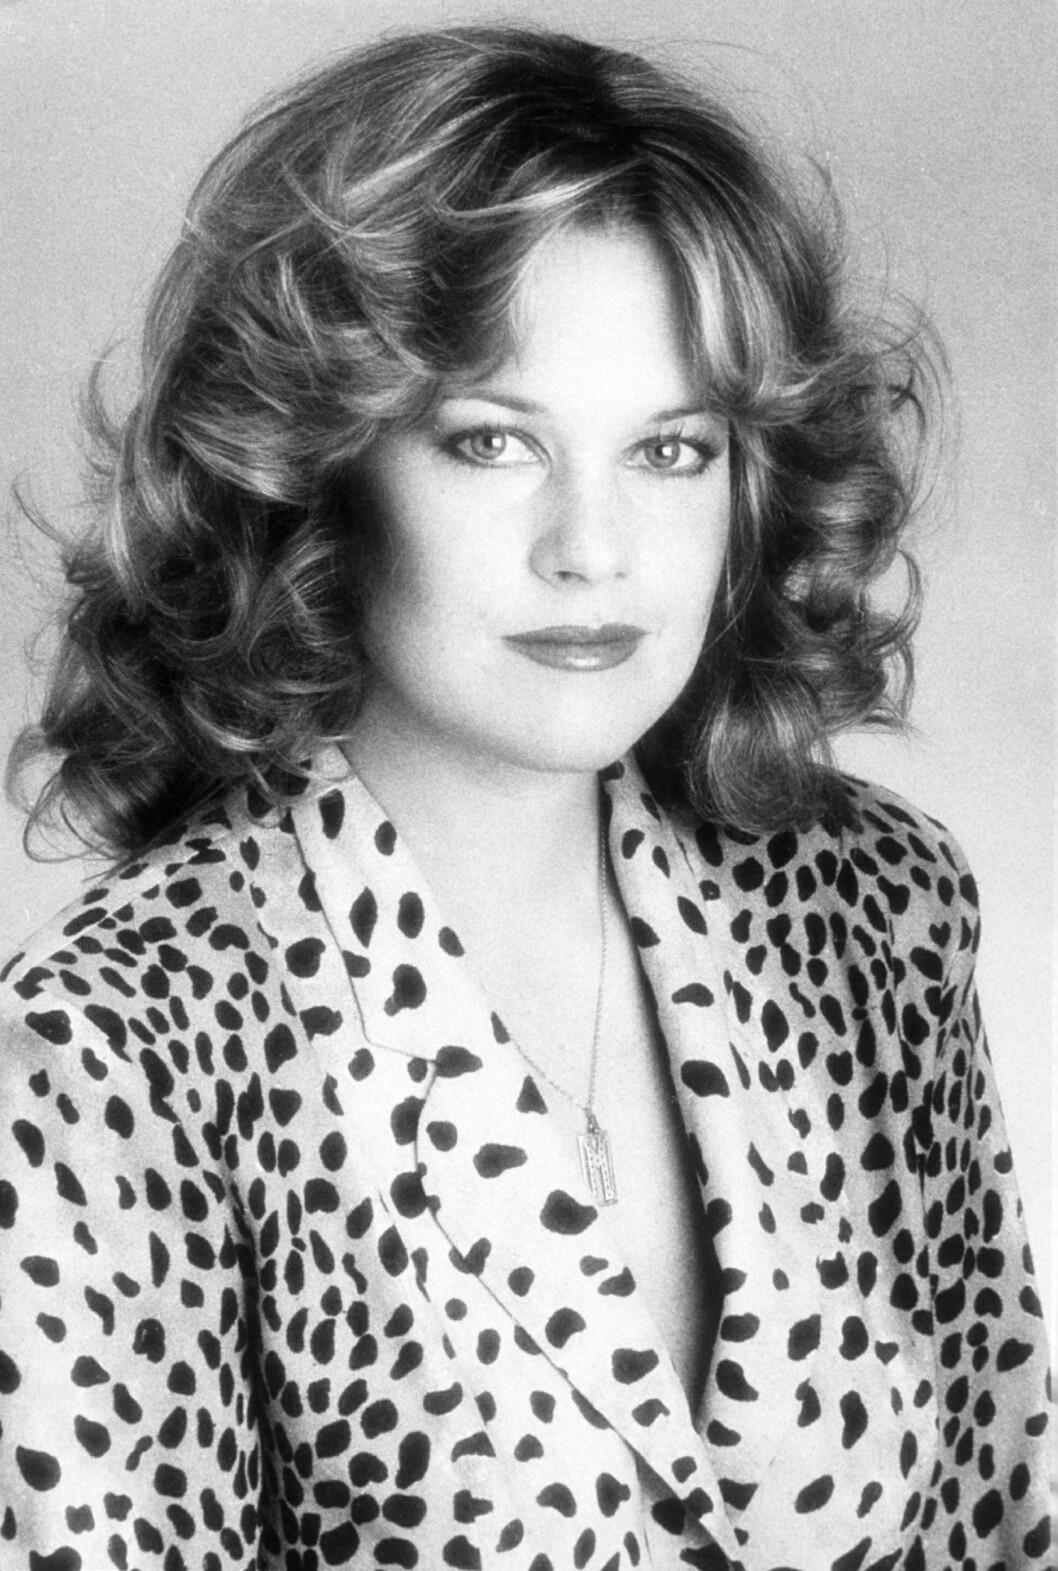 Melanie Griffith på tidlig 1990-tallet.  Foto: REX/ARALDO DI CROLLALANZA/All Over Press